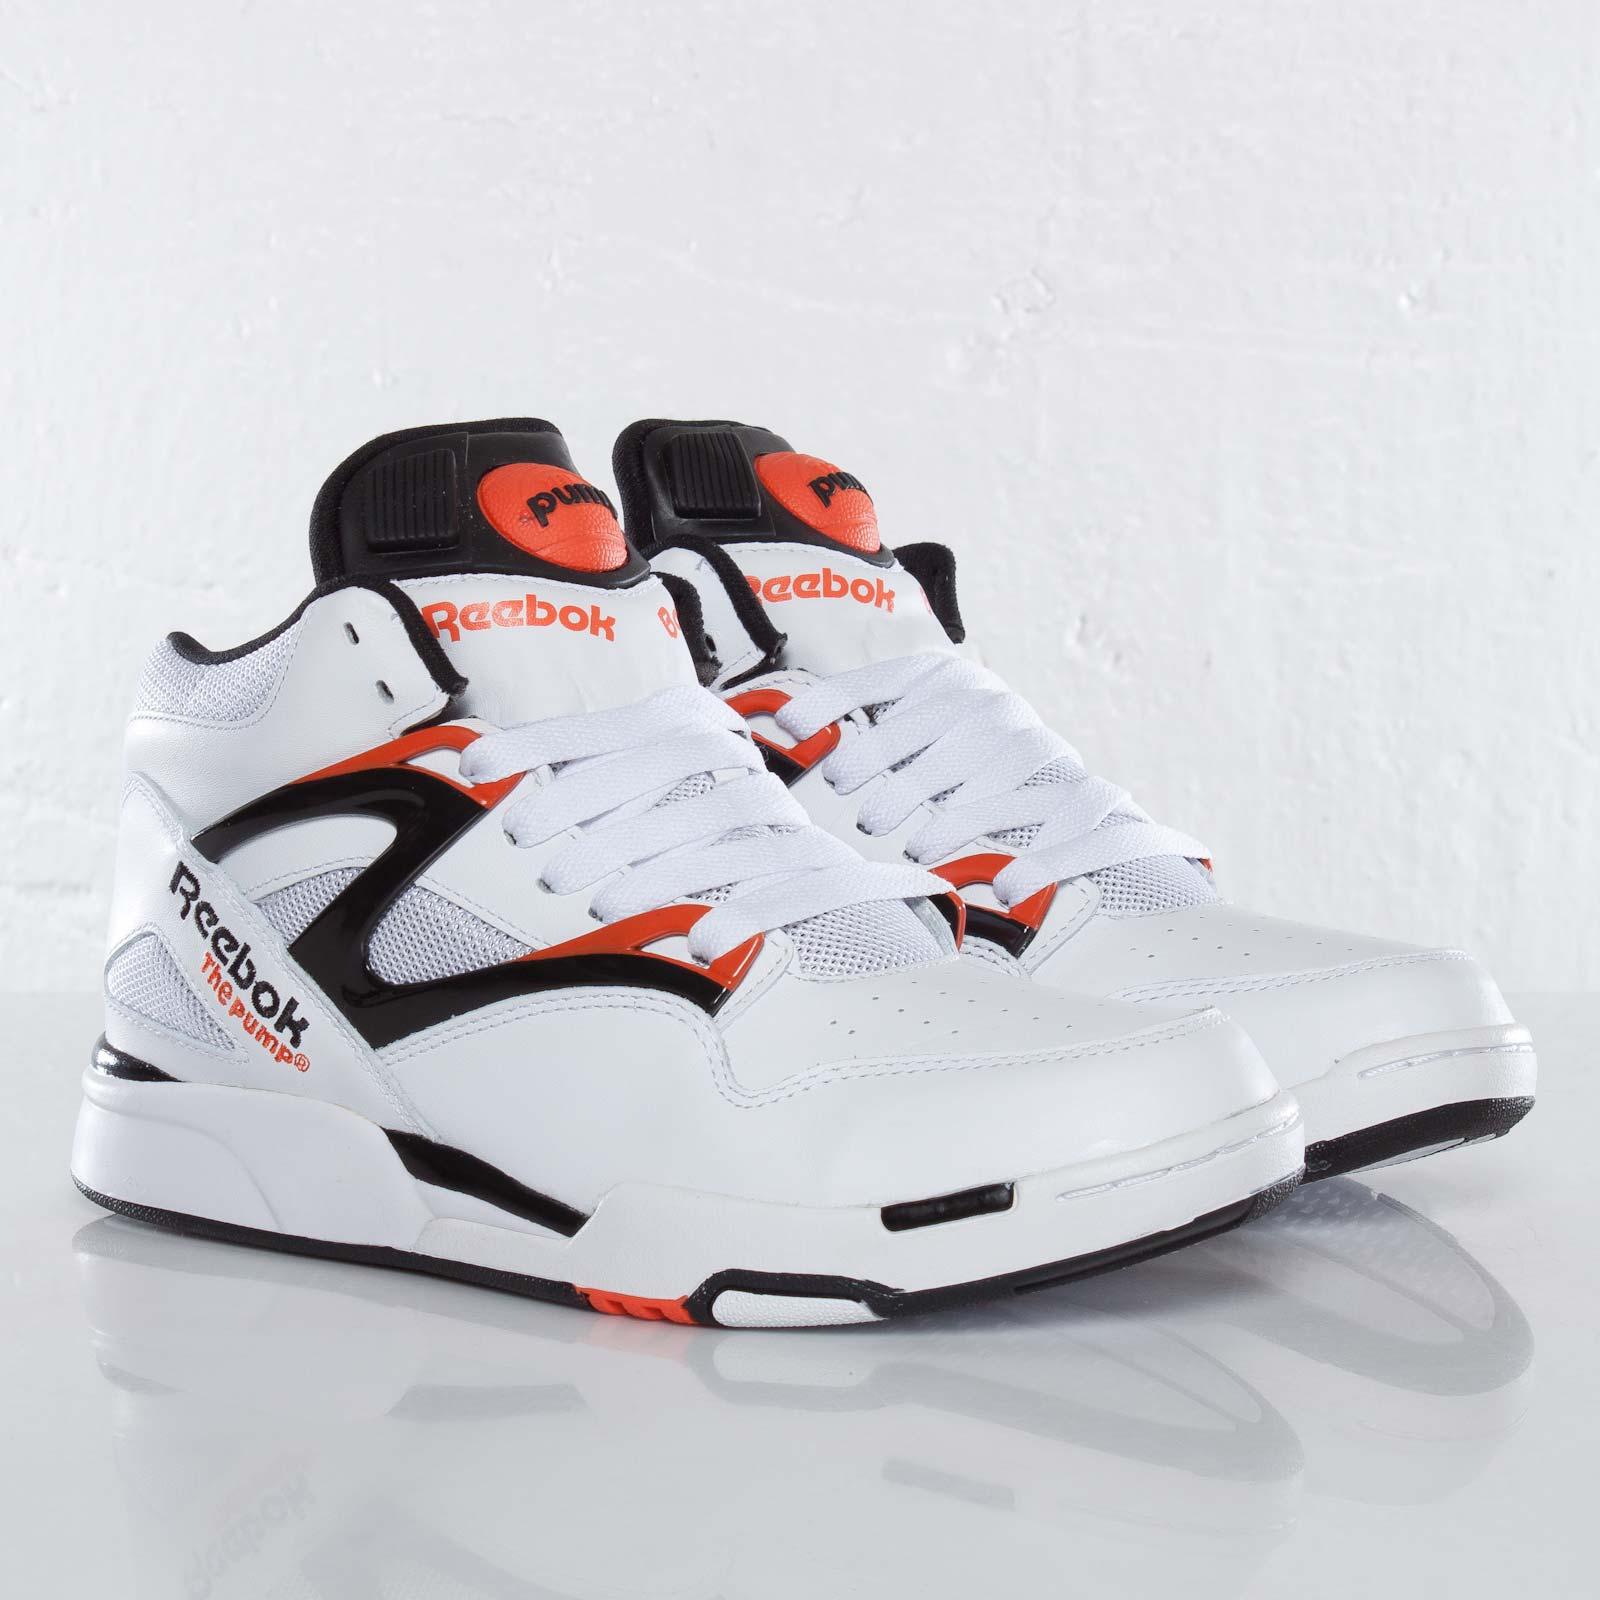 ec8053eb553356 Reebok Pump Omni Lite - J15601 - Sneakersnstuff